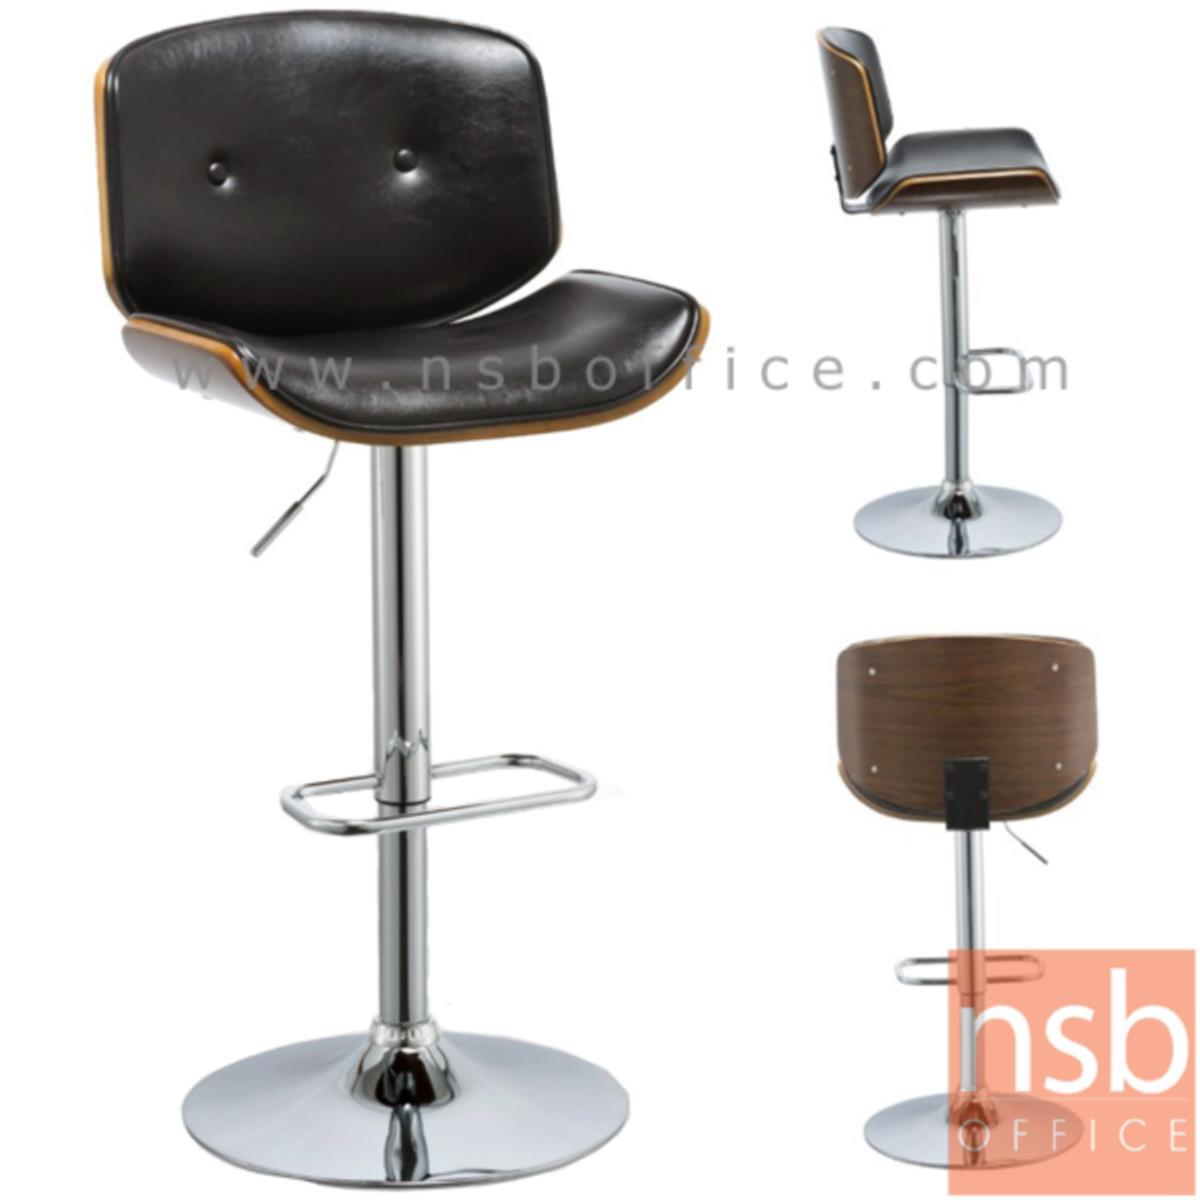 B18A041:เก้าอี้บาร์สูงหนัง PU BY-CAST รุ่น BHS-9871 ขนาด 51W cm. โช๊คแก๊ส ขาโครเมี่ยมฐานจานกลม